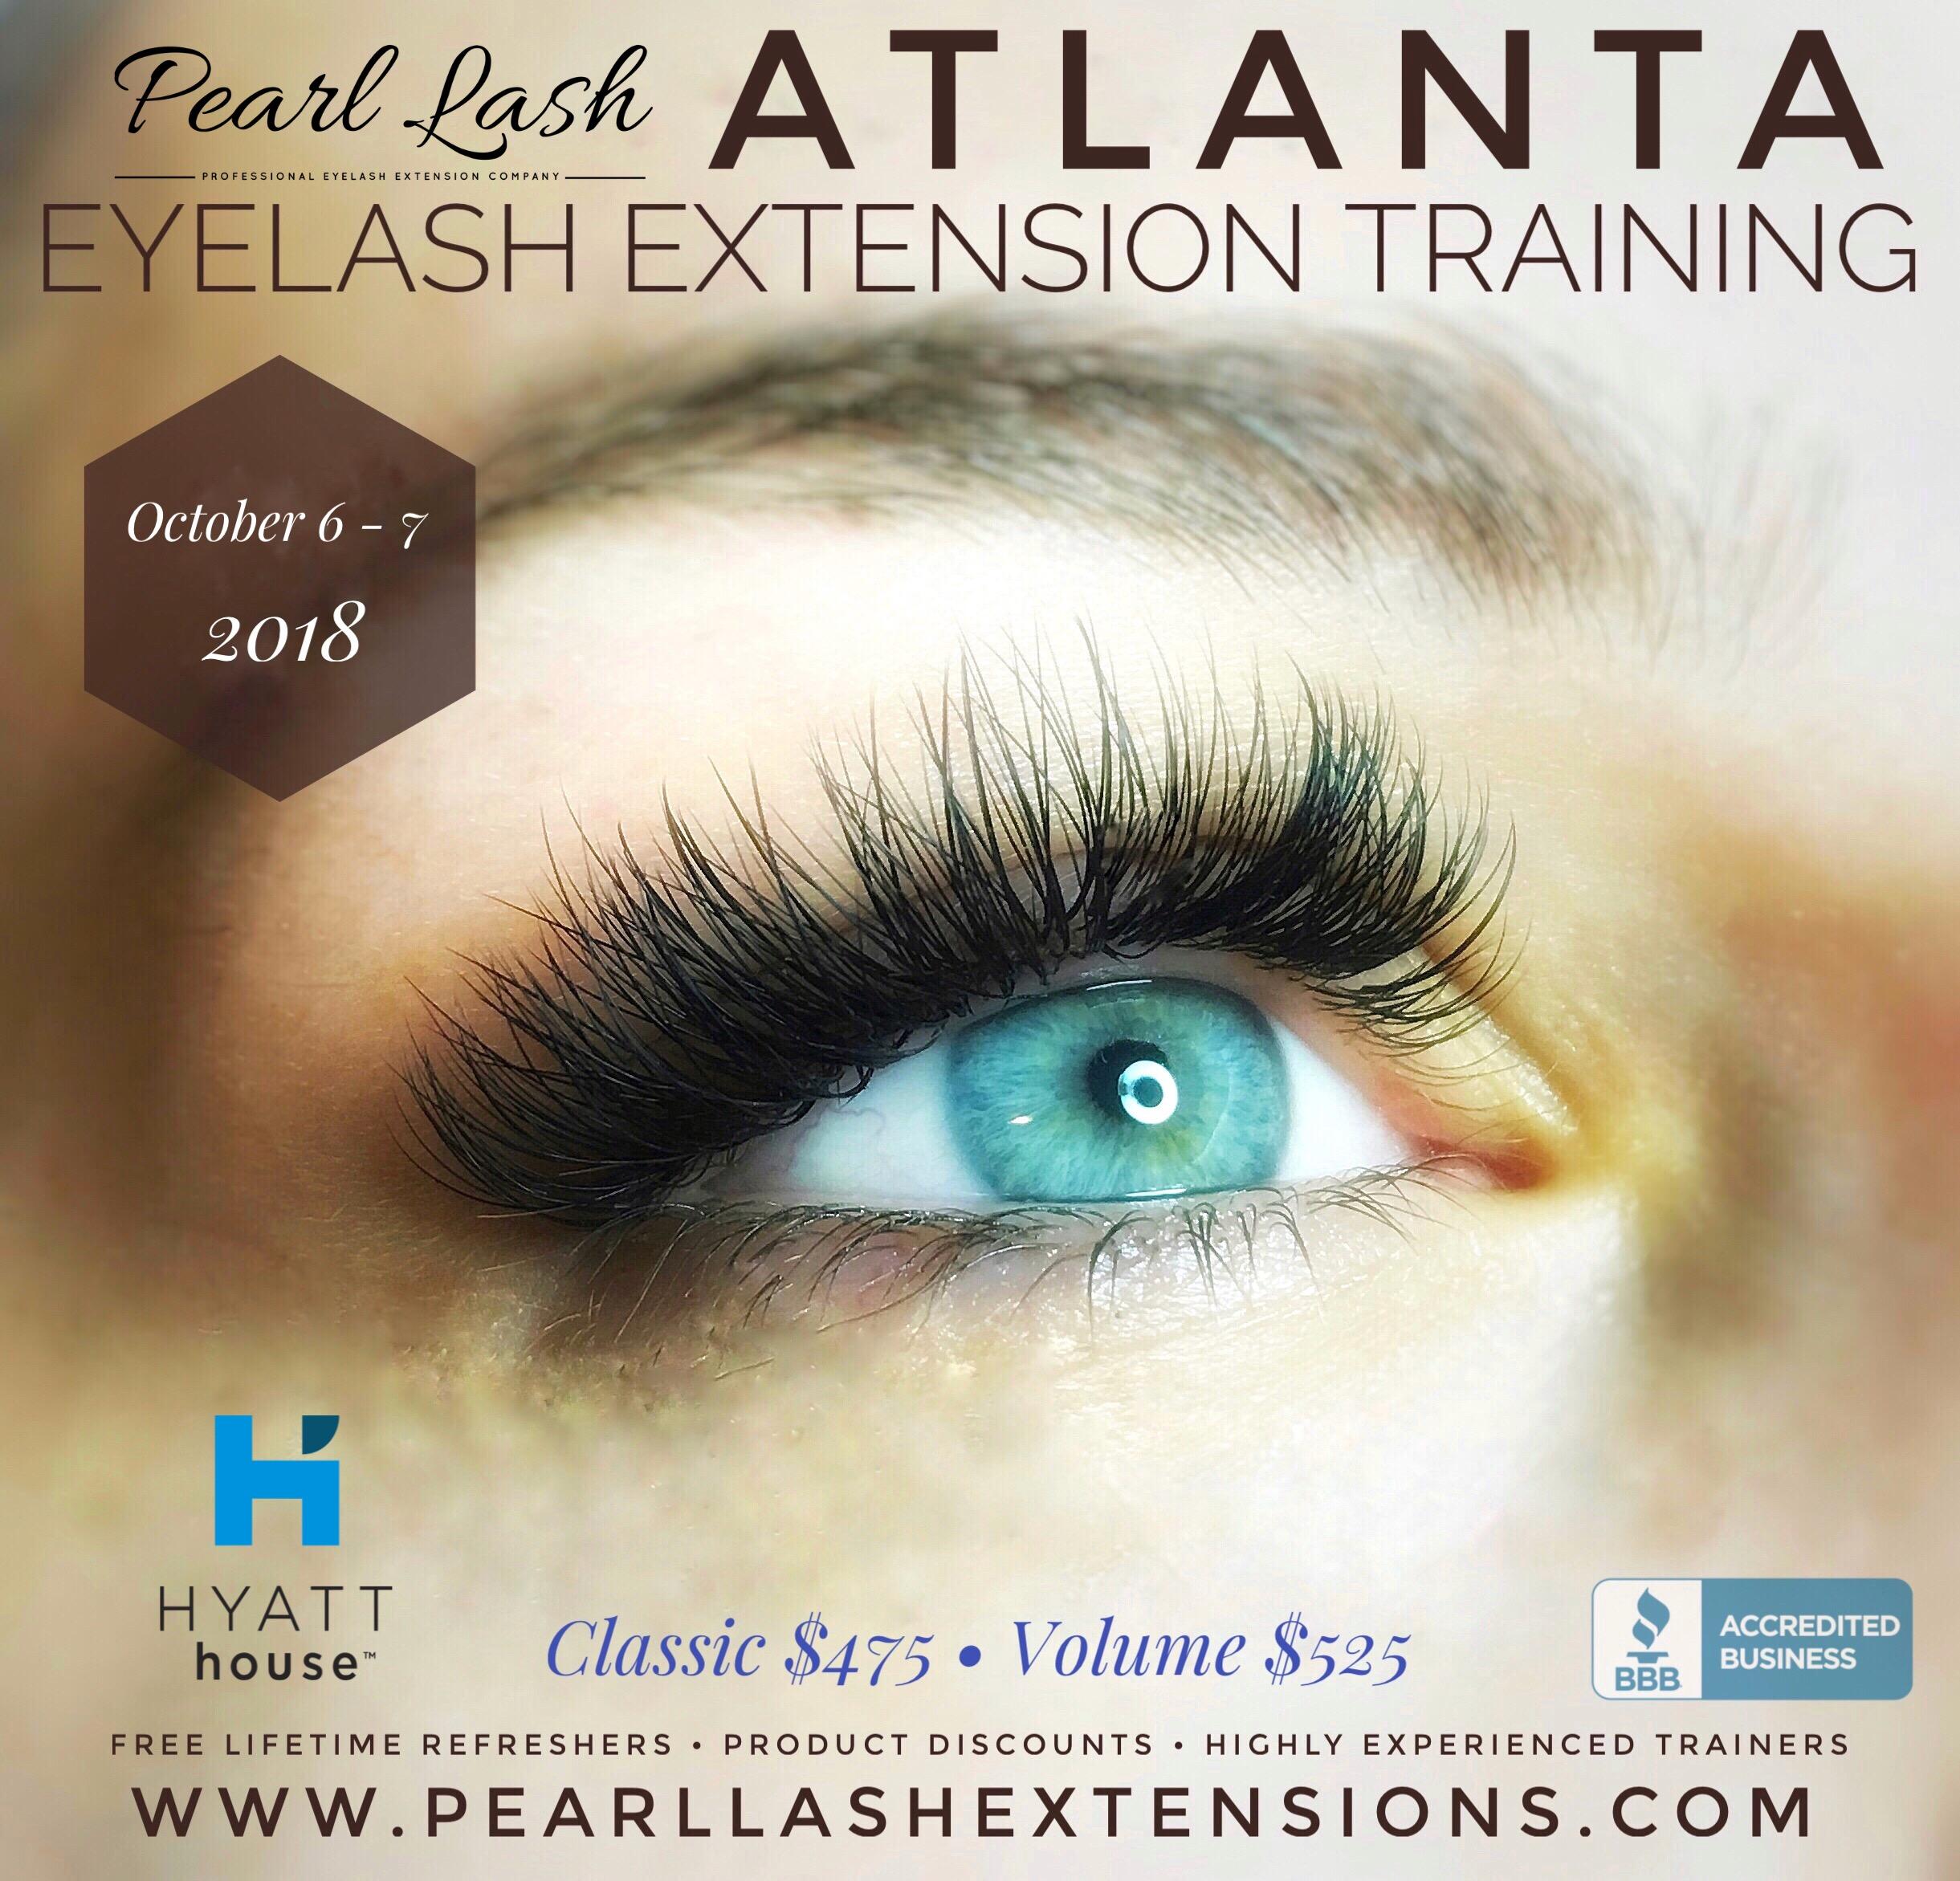 ea9bccd6ed4 Eyelash Extension Training Event Atlanta by Pearl Lash- Event ...